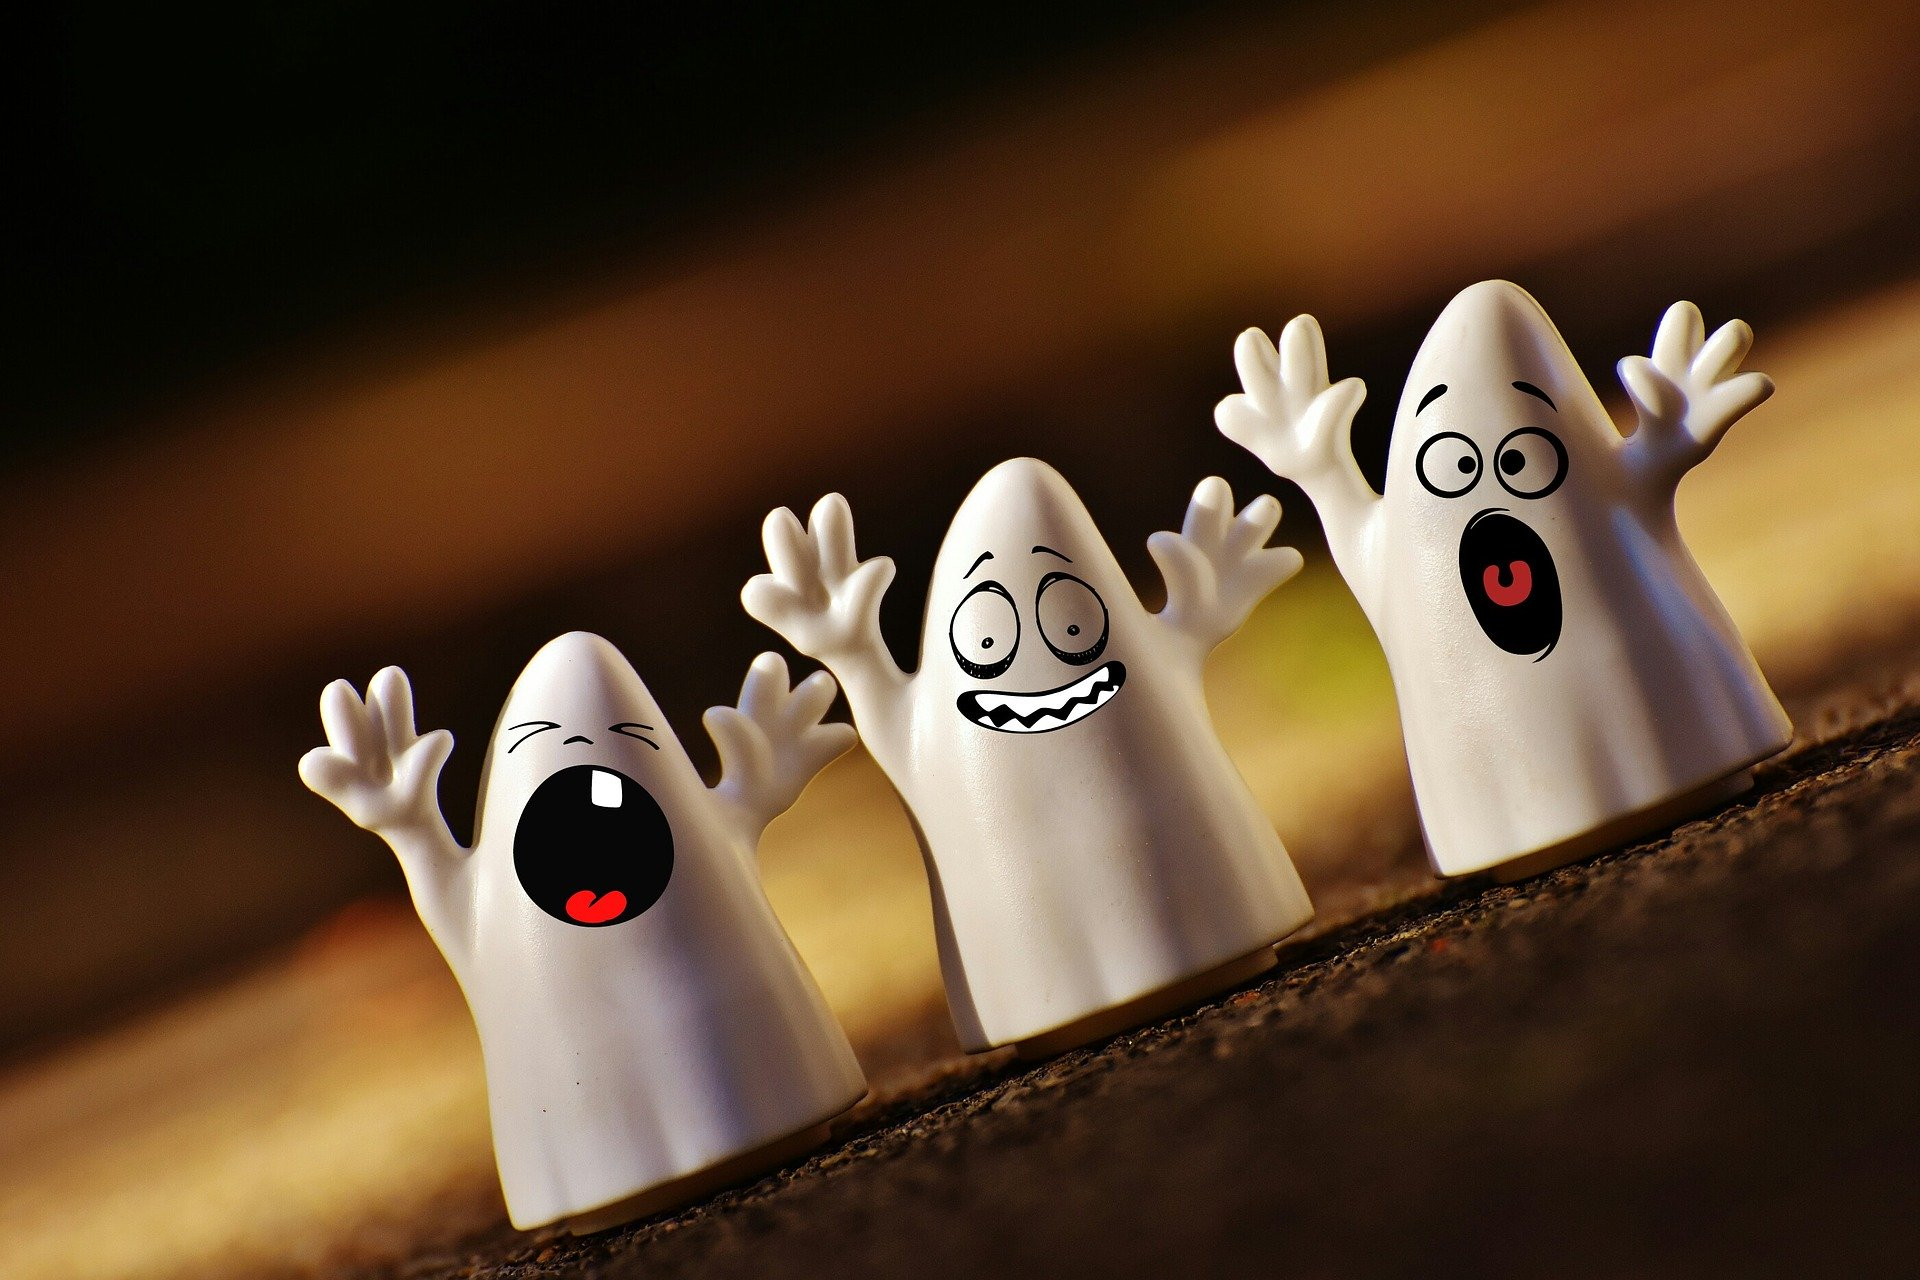 Owasso Area Halloween Events